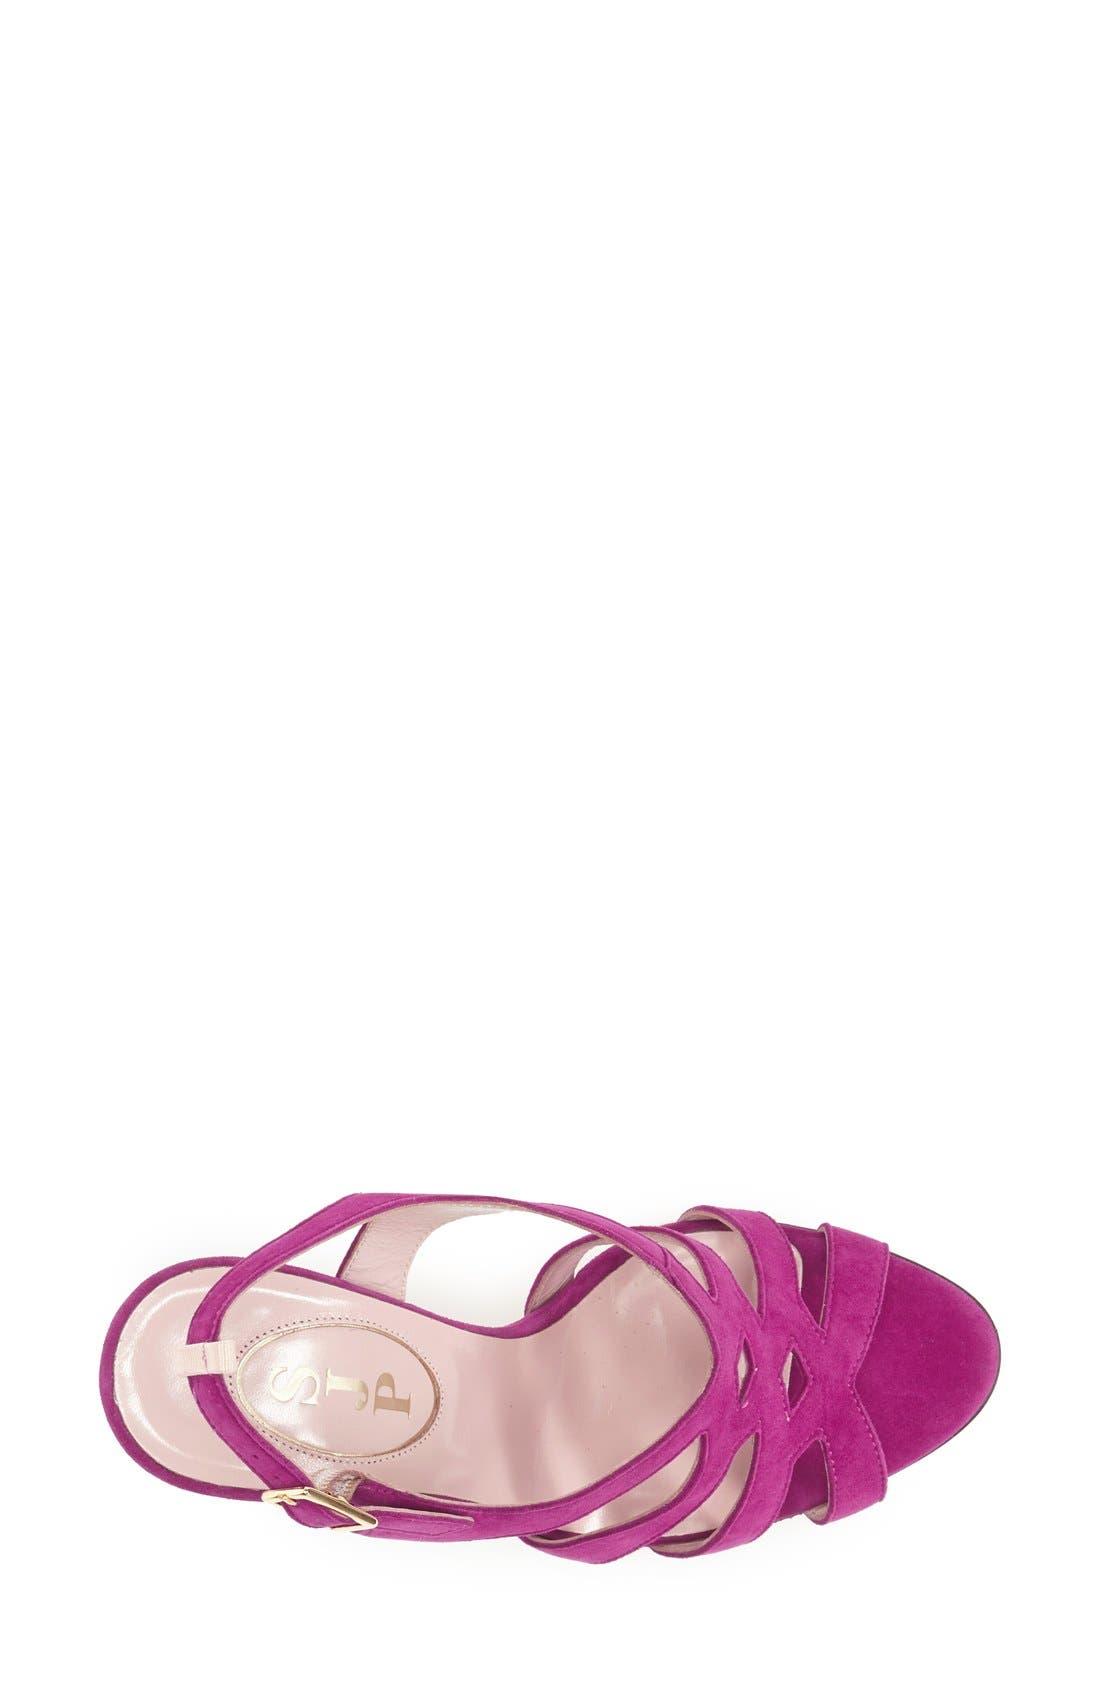 Alternate Image 3  - SJP by Sarah Jessica Parker 'Georgie' Suede Slingback Sandal (Women)